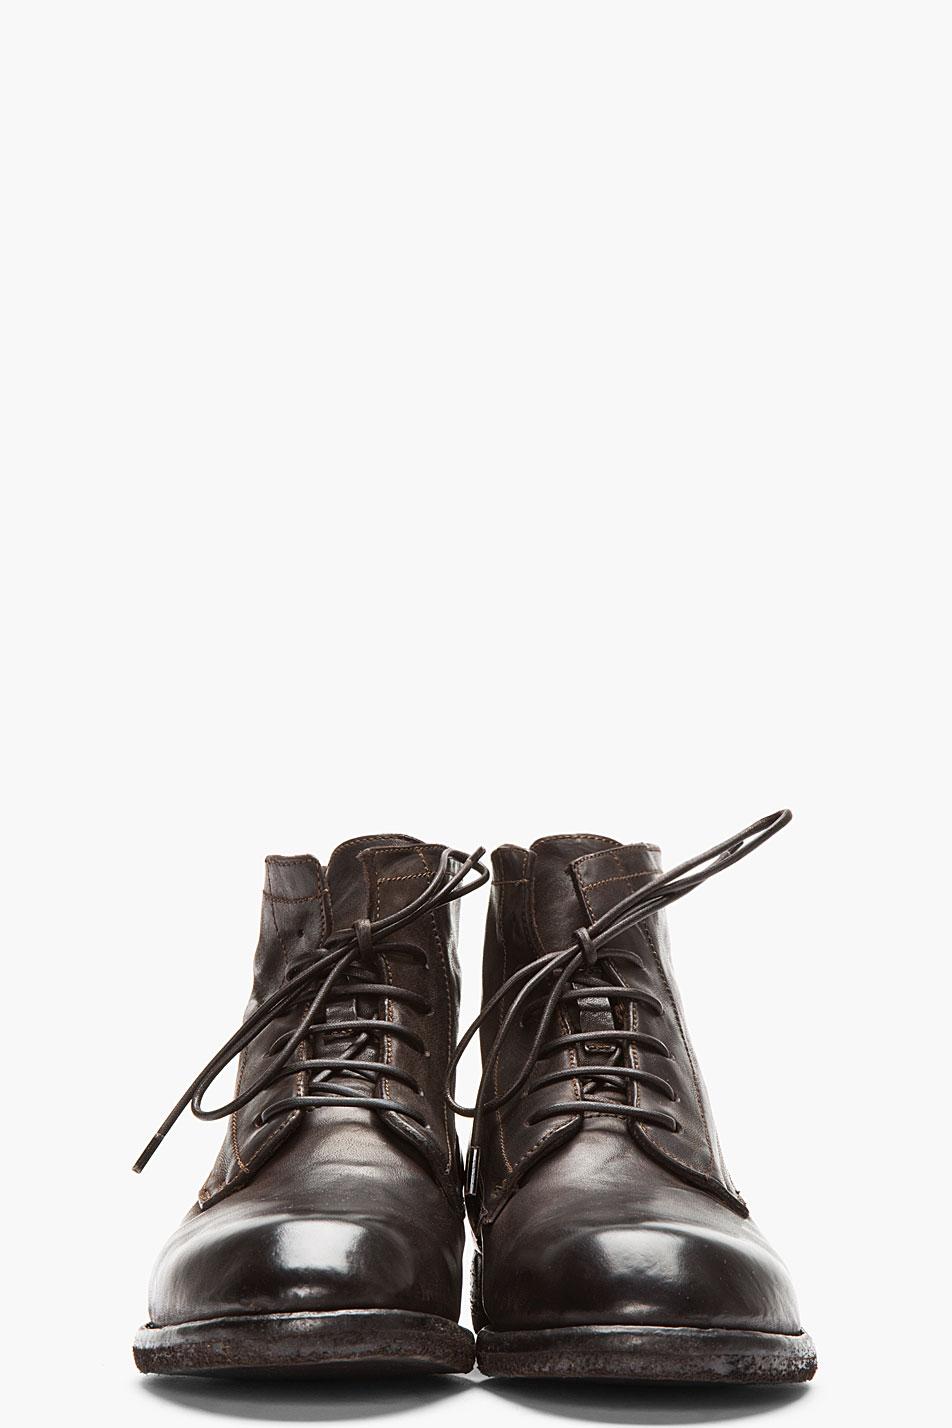 Excellent Officine Creative Womenu2019s Cuban Heel Ankle Boot   Www.teexe.com